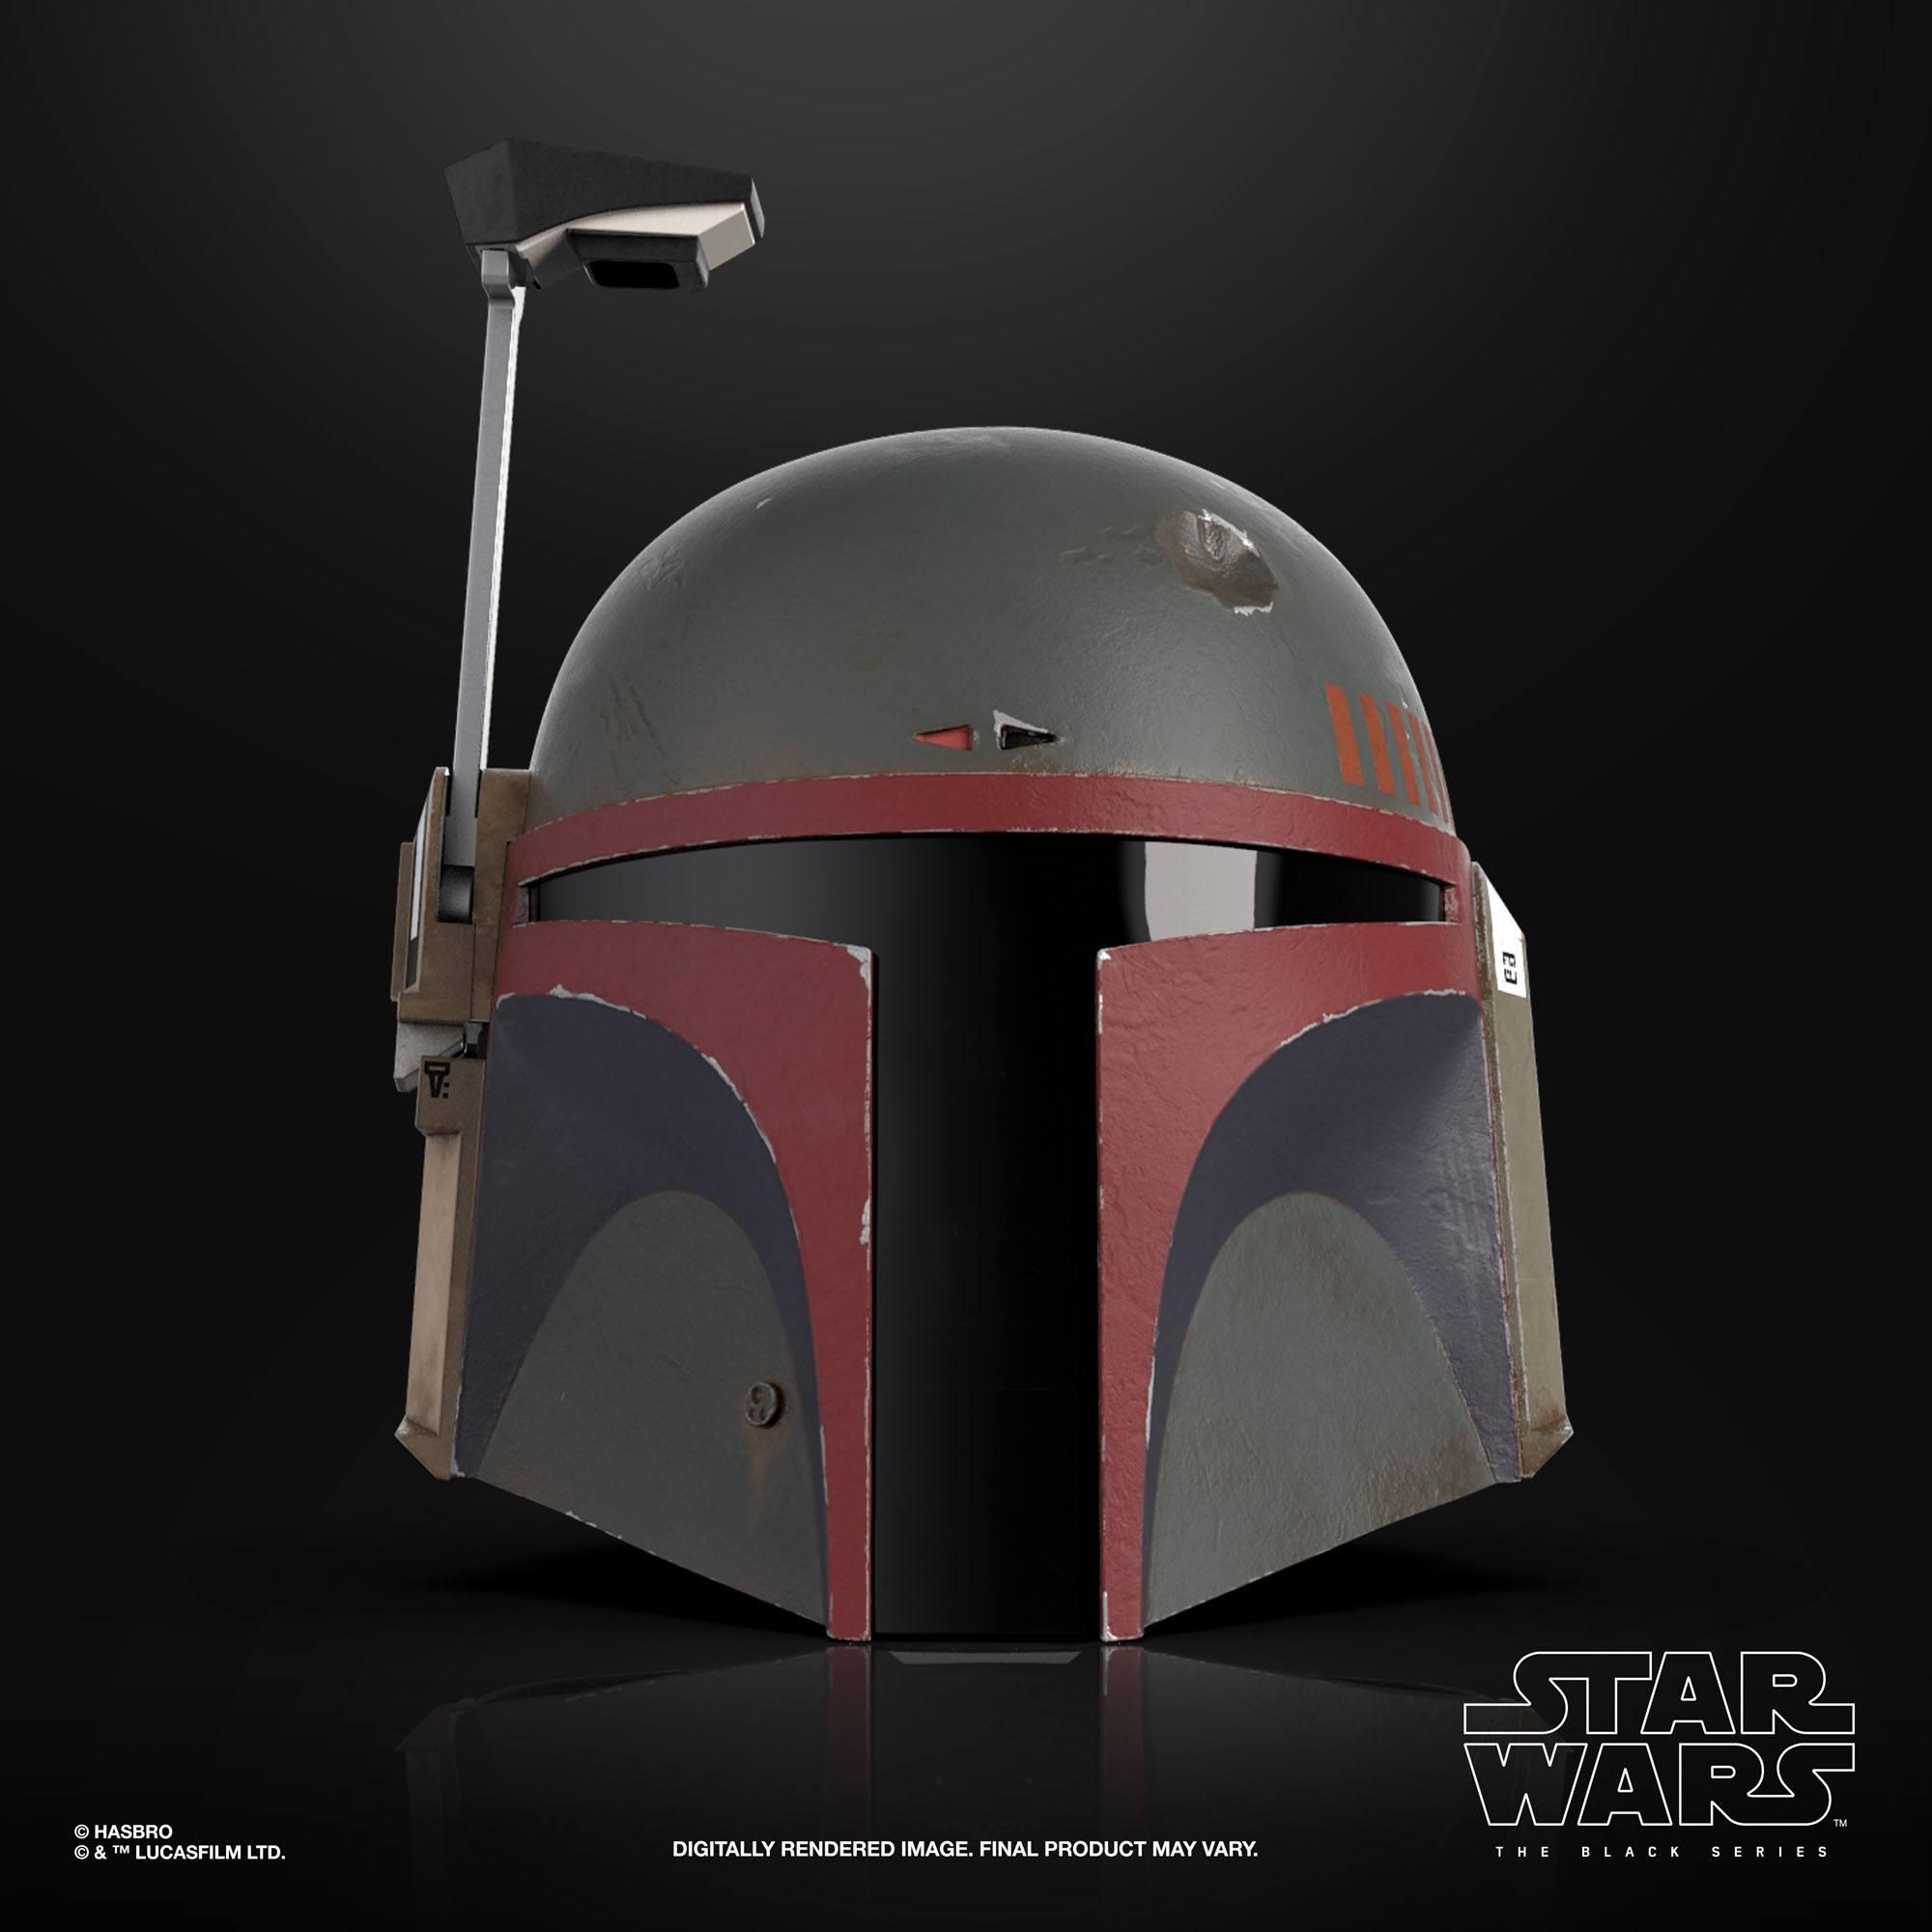 Star Wars The Mandalorian Black Series Elektronischer Helm Boba Fett (Re-Armored) F52815L0 5010993927685